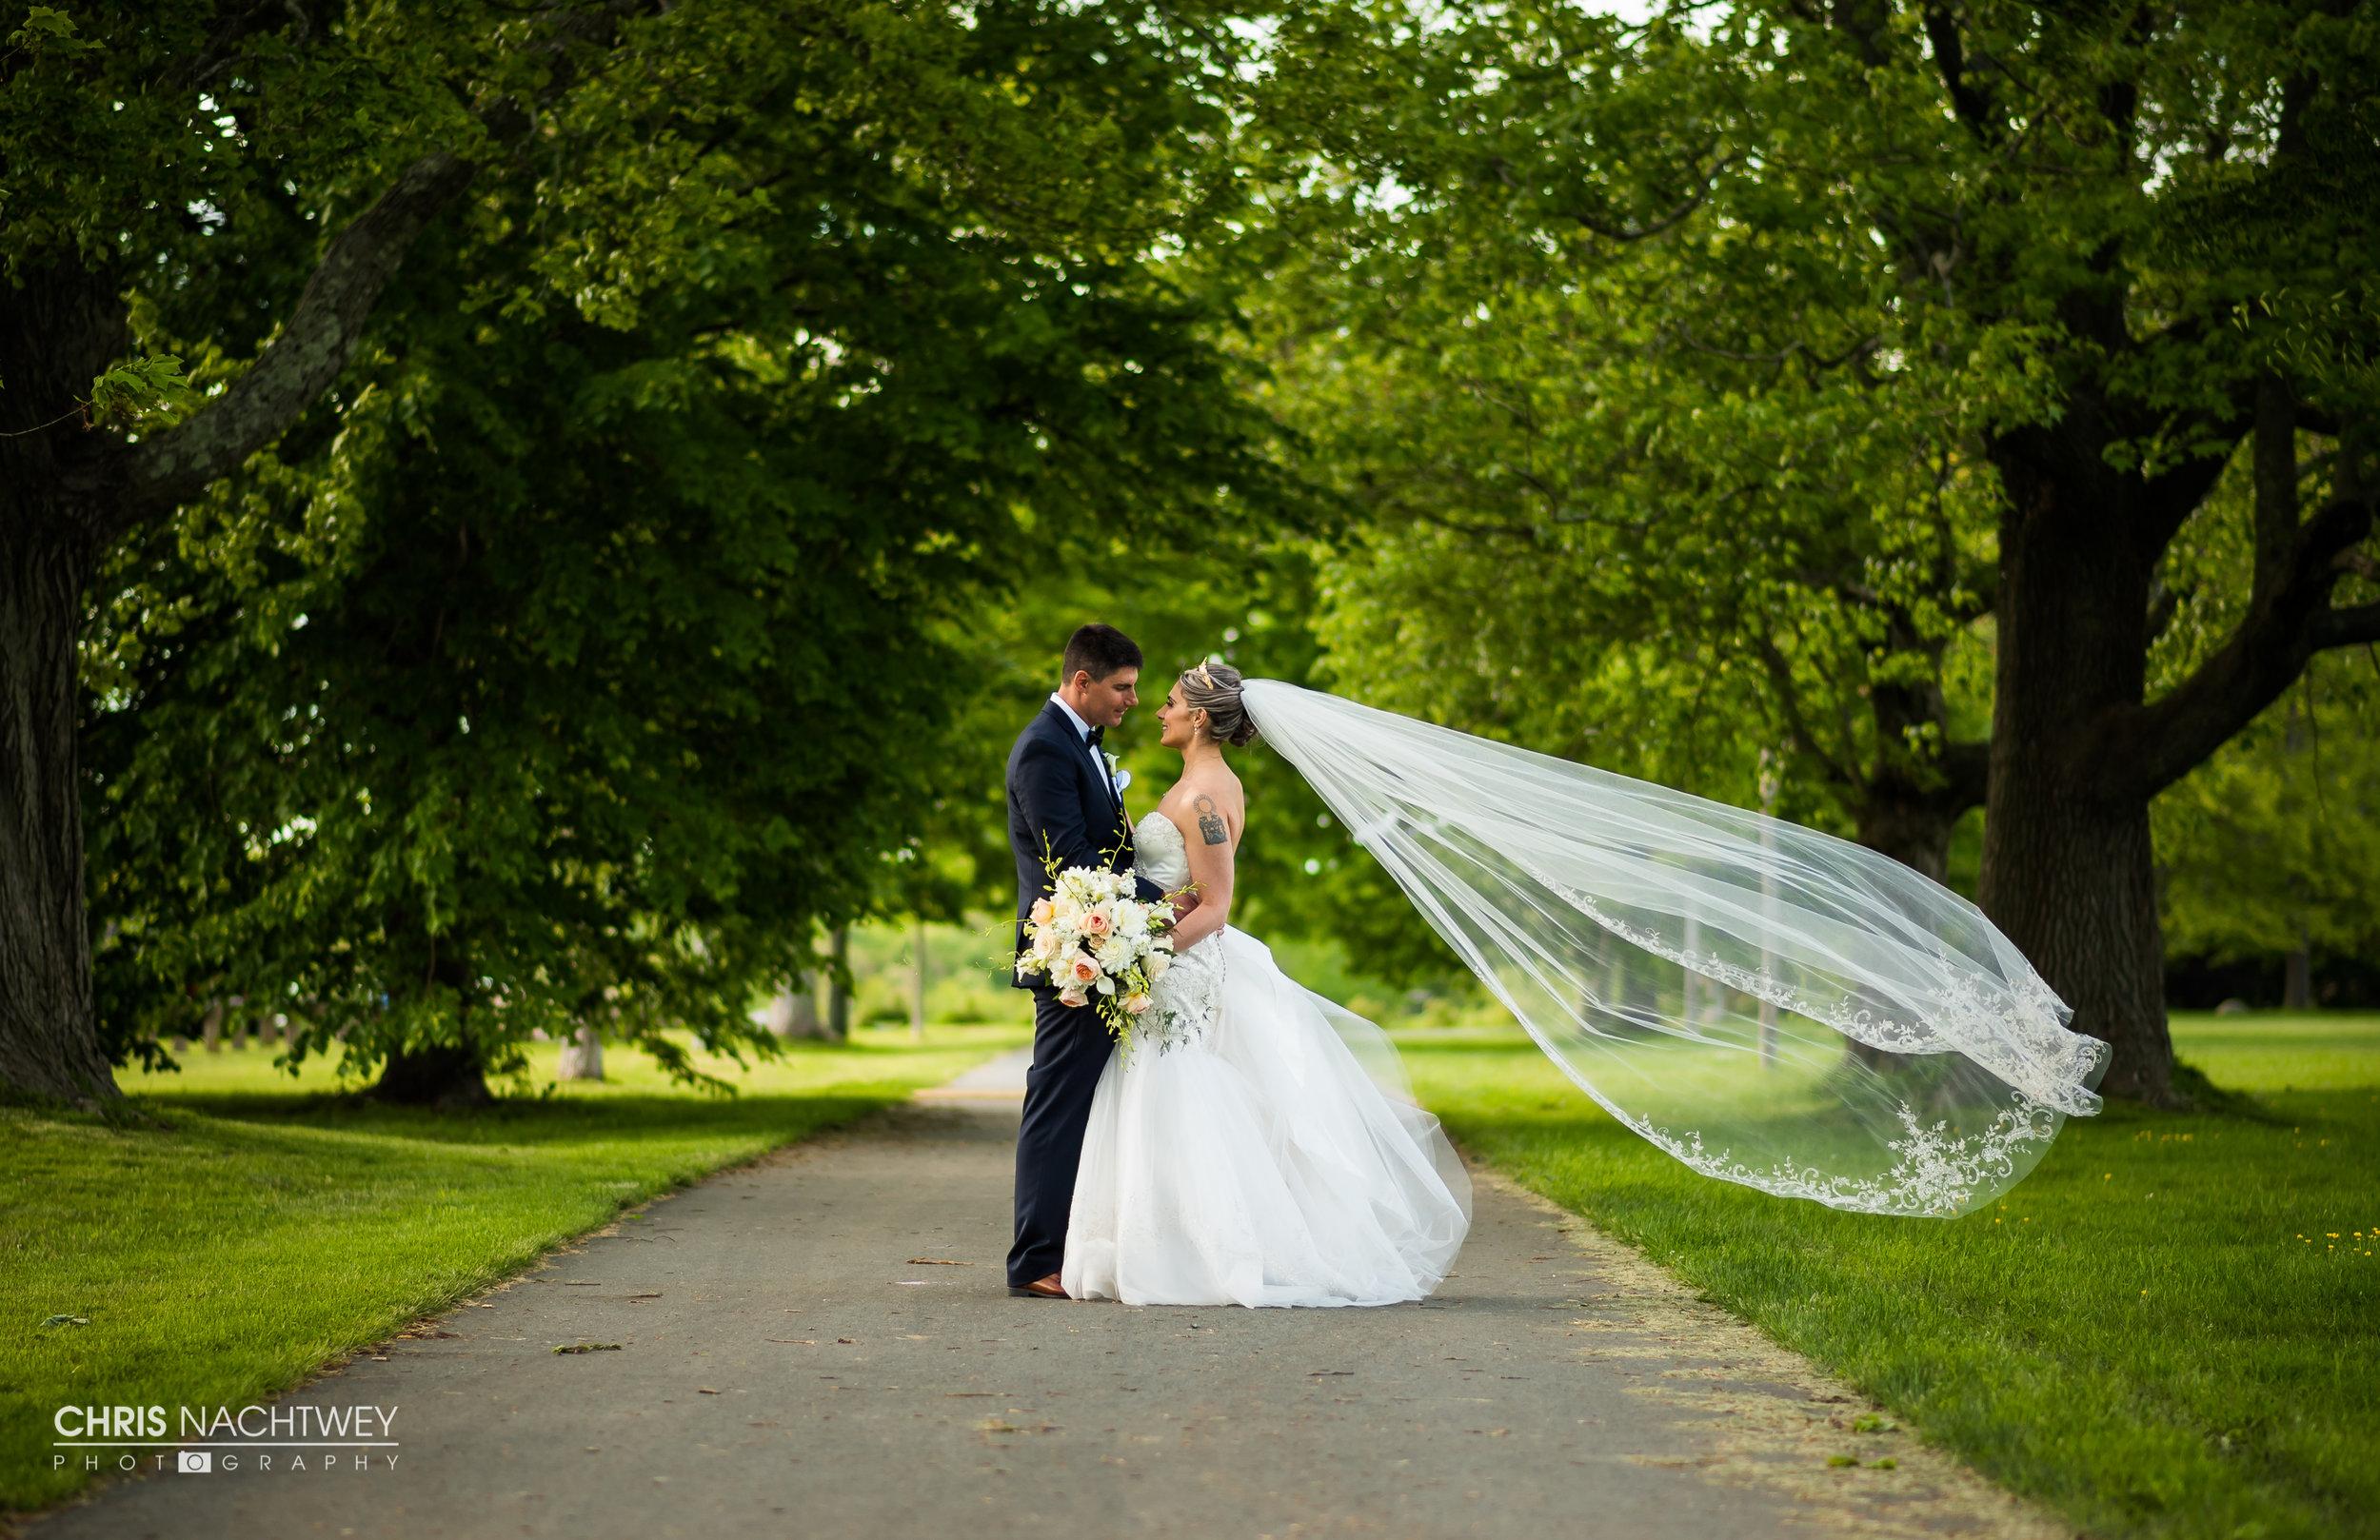 mystic-artistic-wedding-photographer-chris-nachtwey-2017-20.jpg